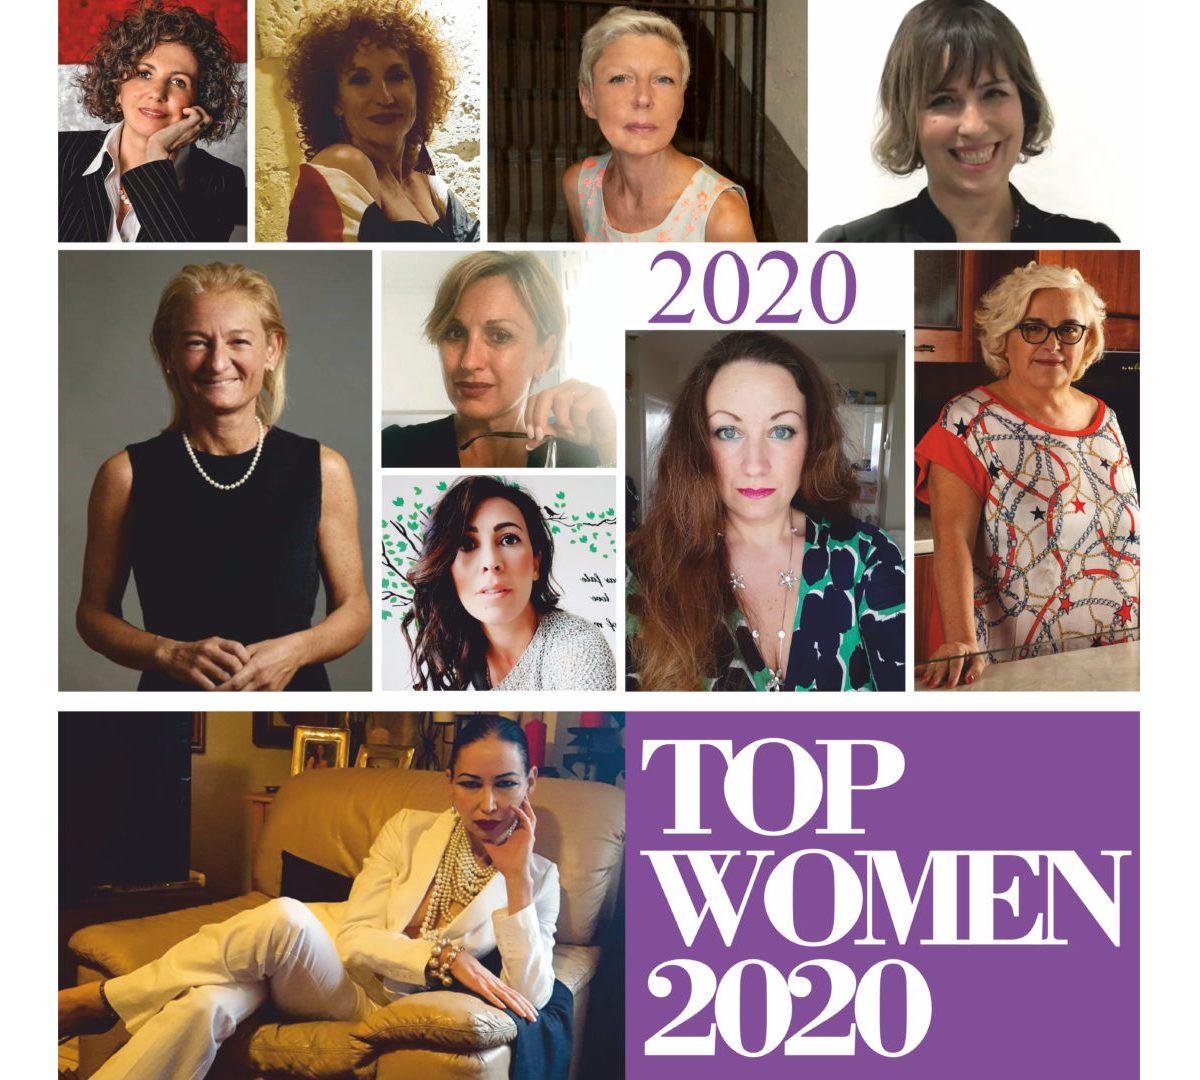 TOP-WOMAN-2020--1082x1080